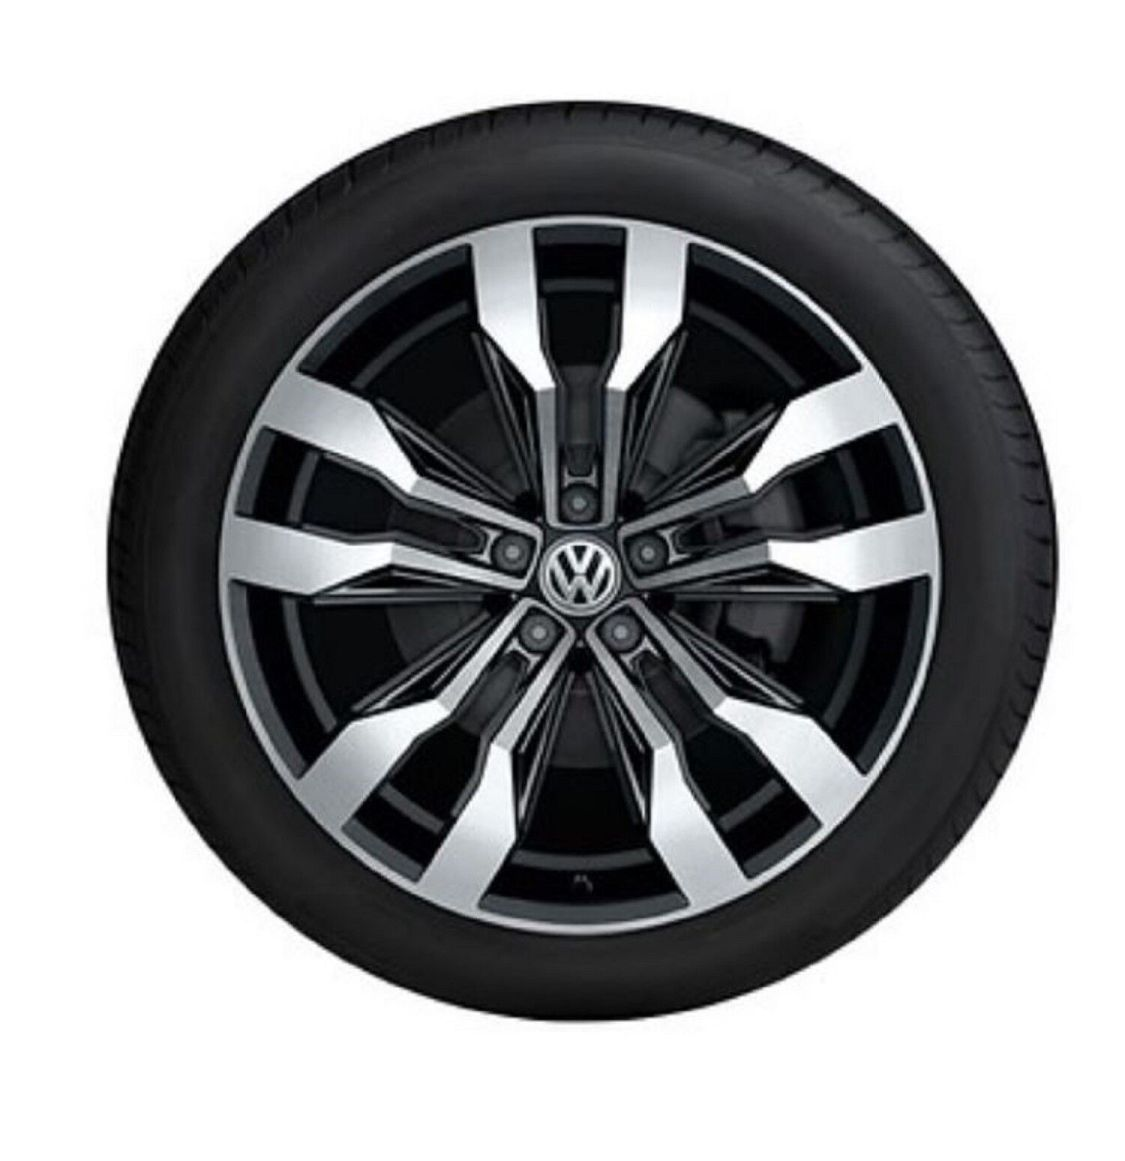 ORIGINAL VW Alufelge Leichtmetallfelge SUZUKA 8x19 VW T-ROC 2GA071499 NQ9